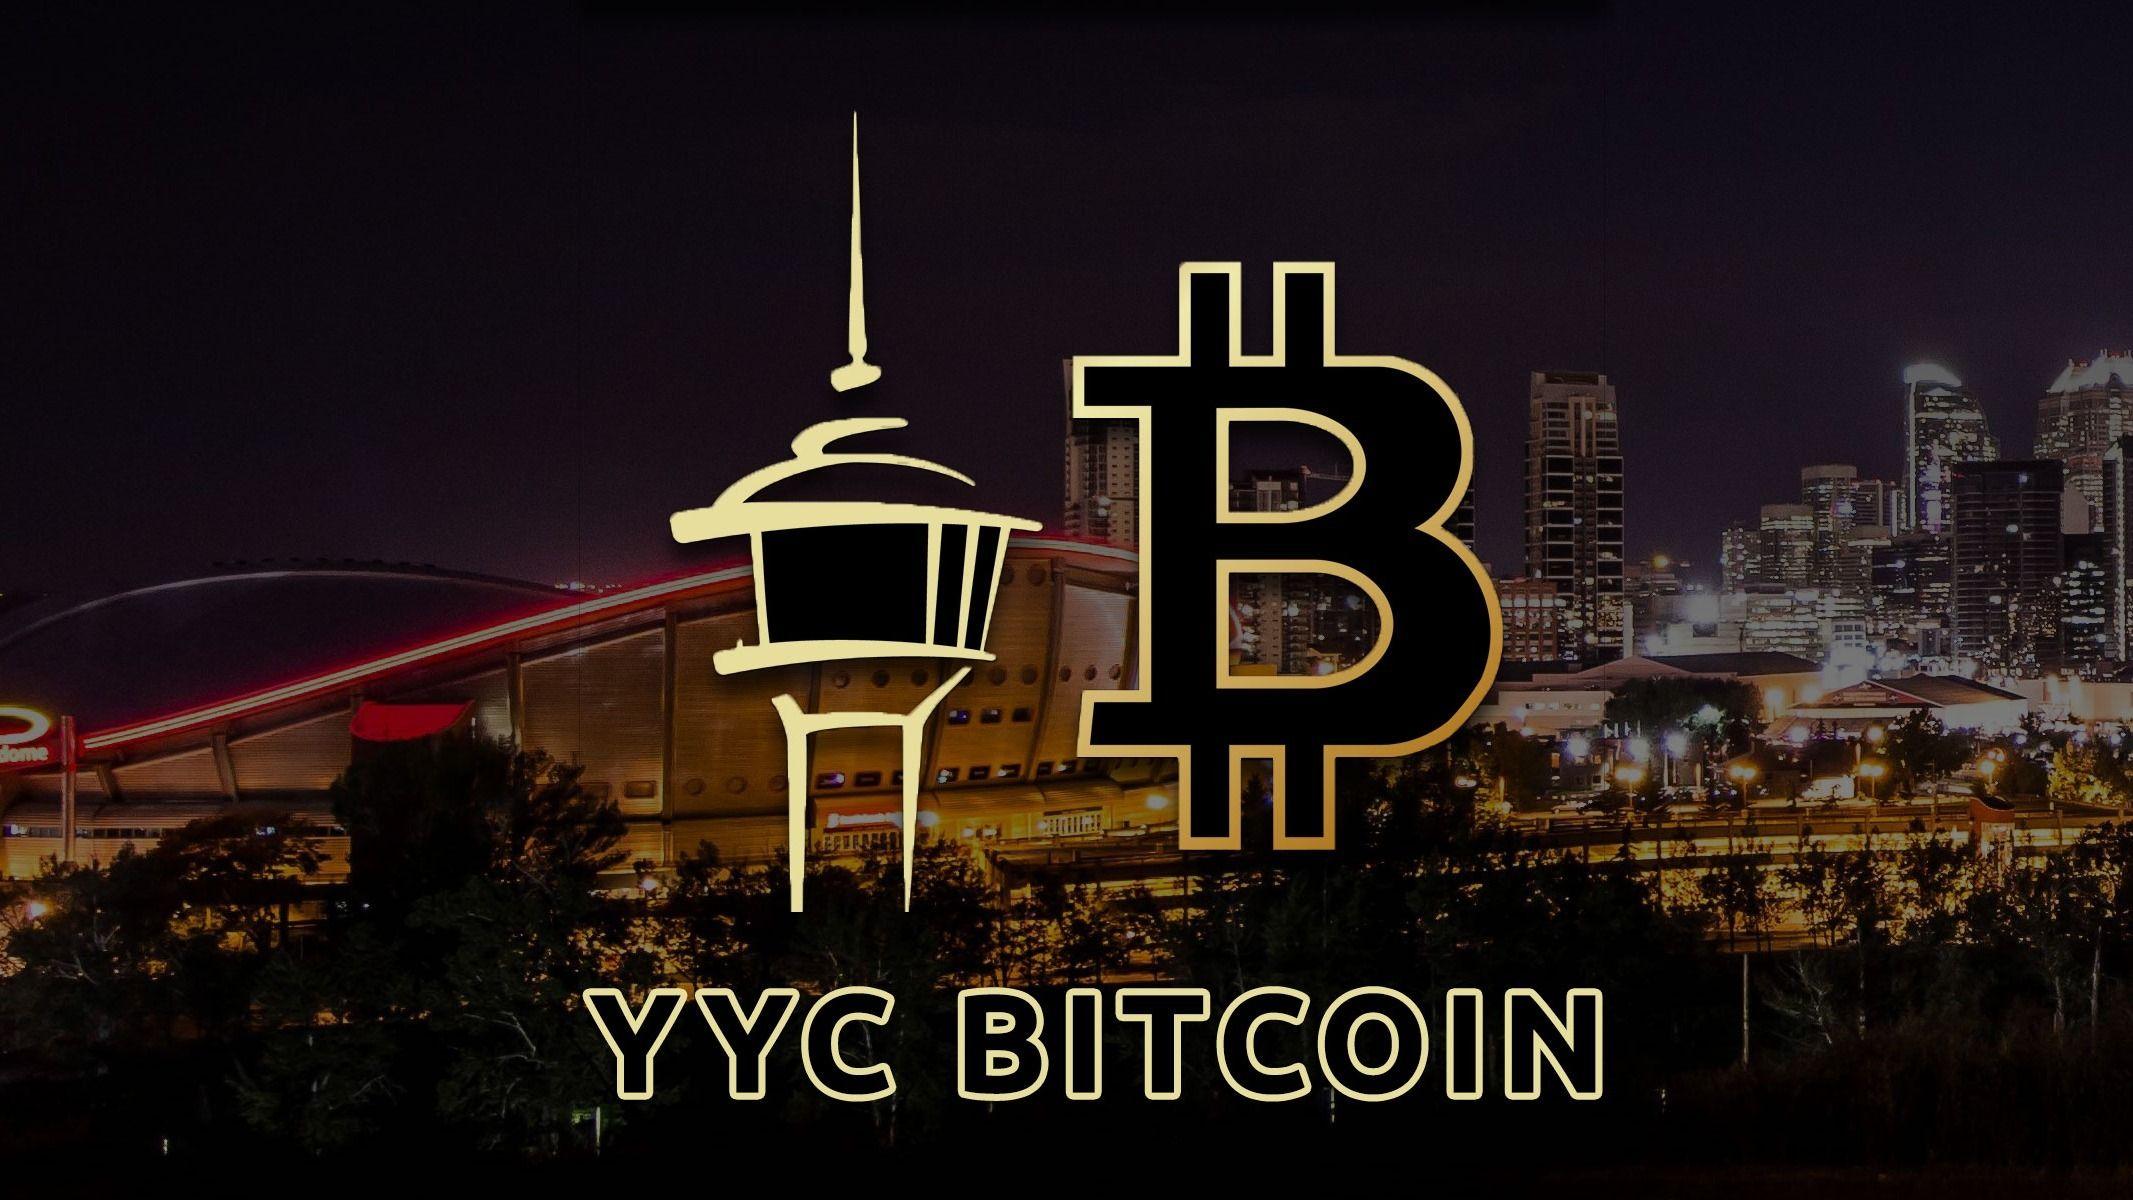 YYC Bitcoin - Calgary's Bitcoin Meetup